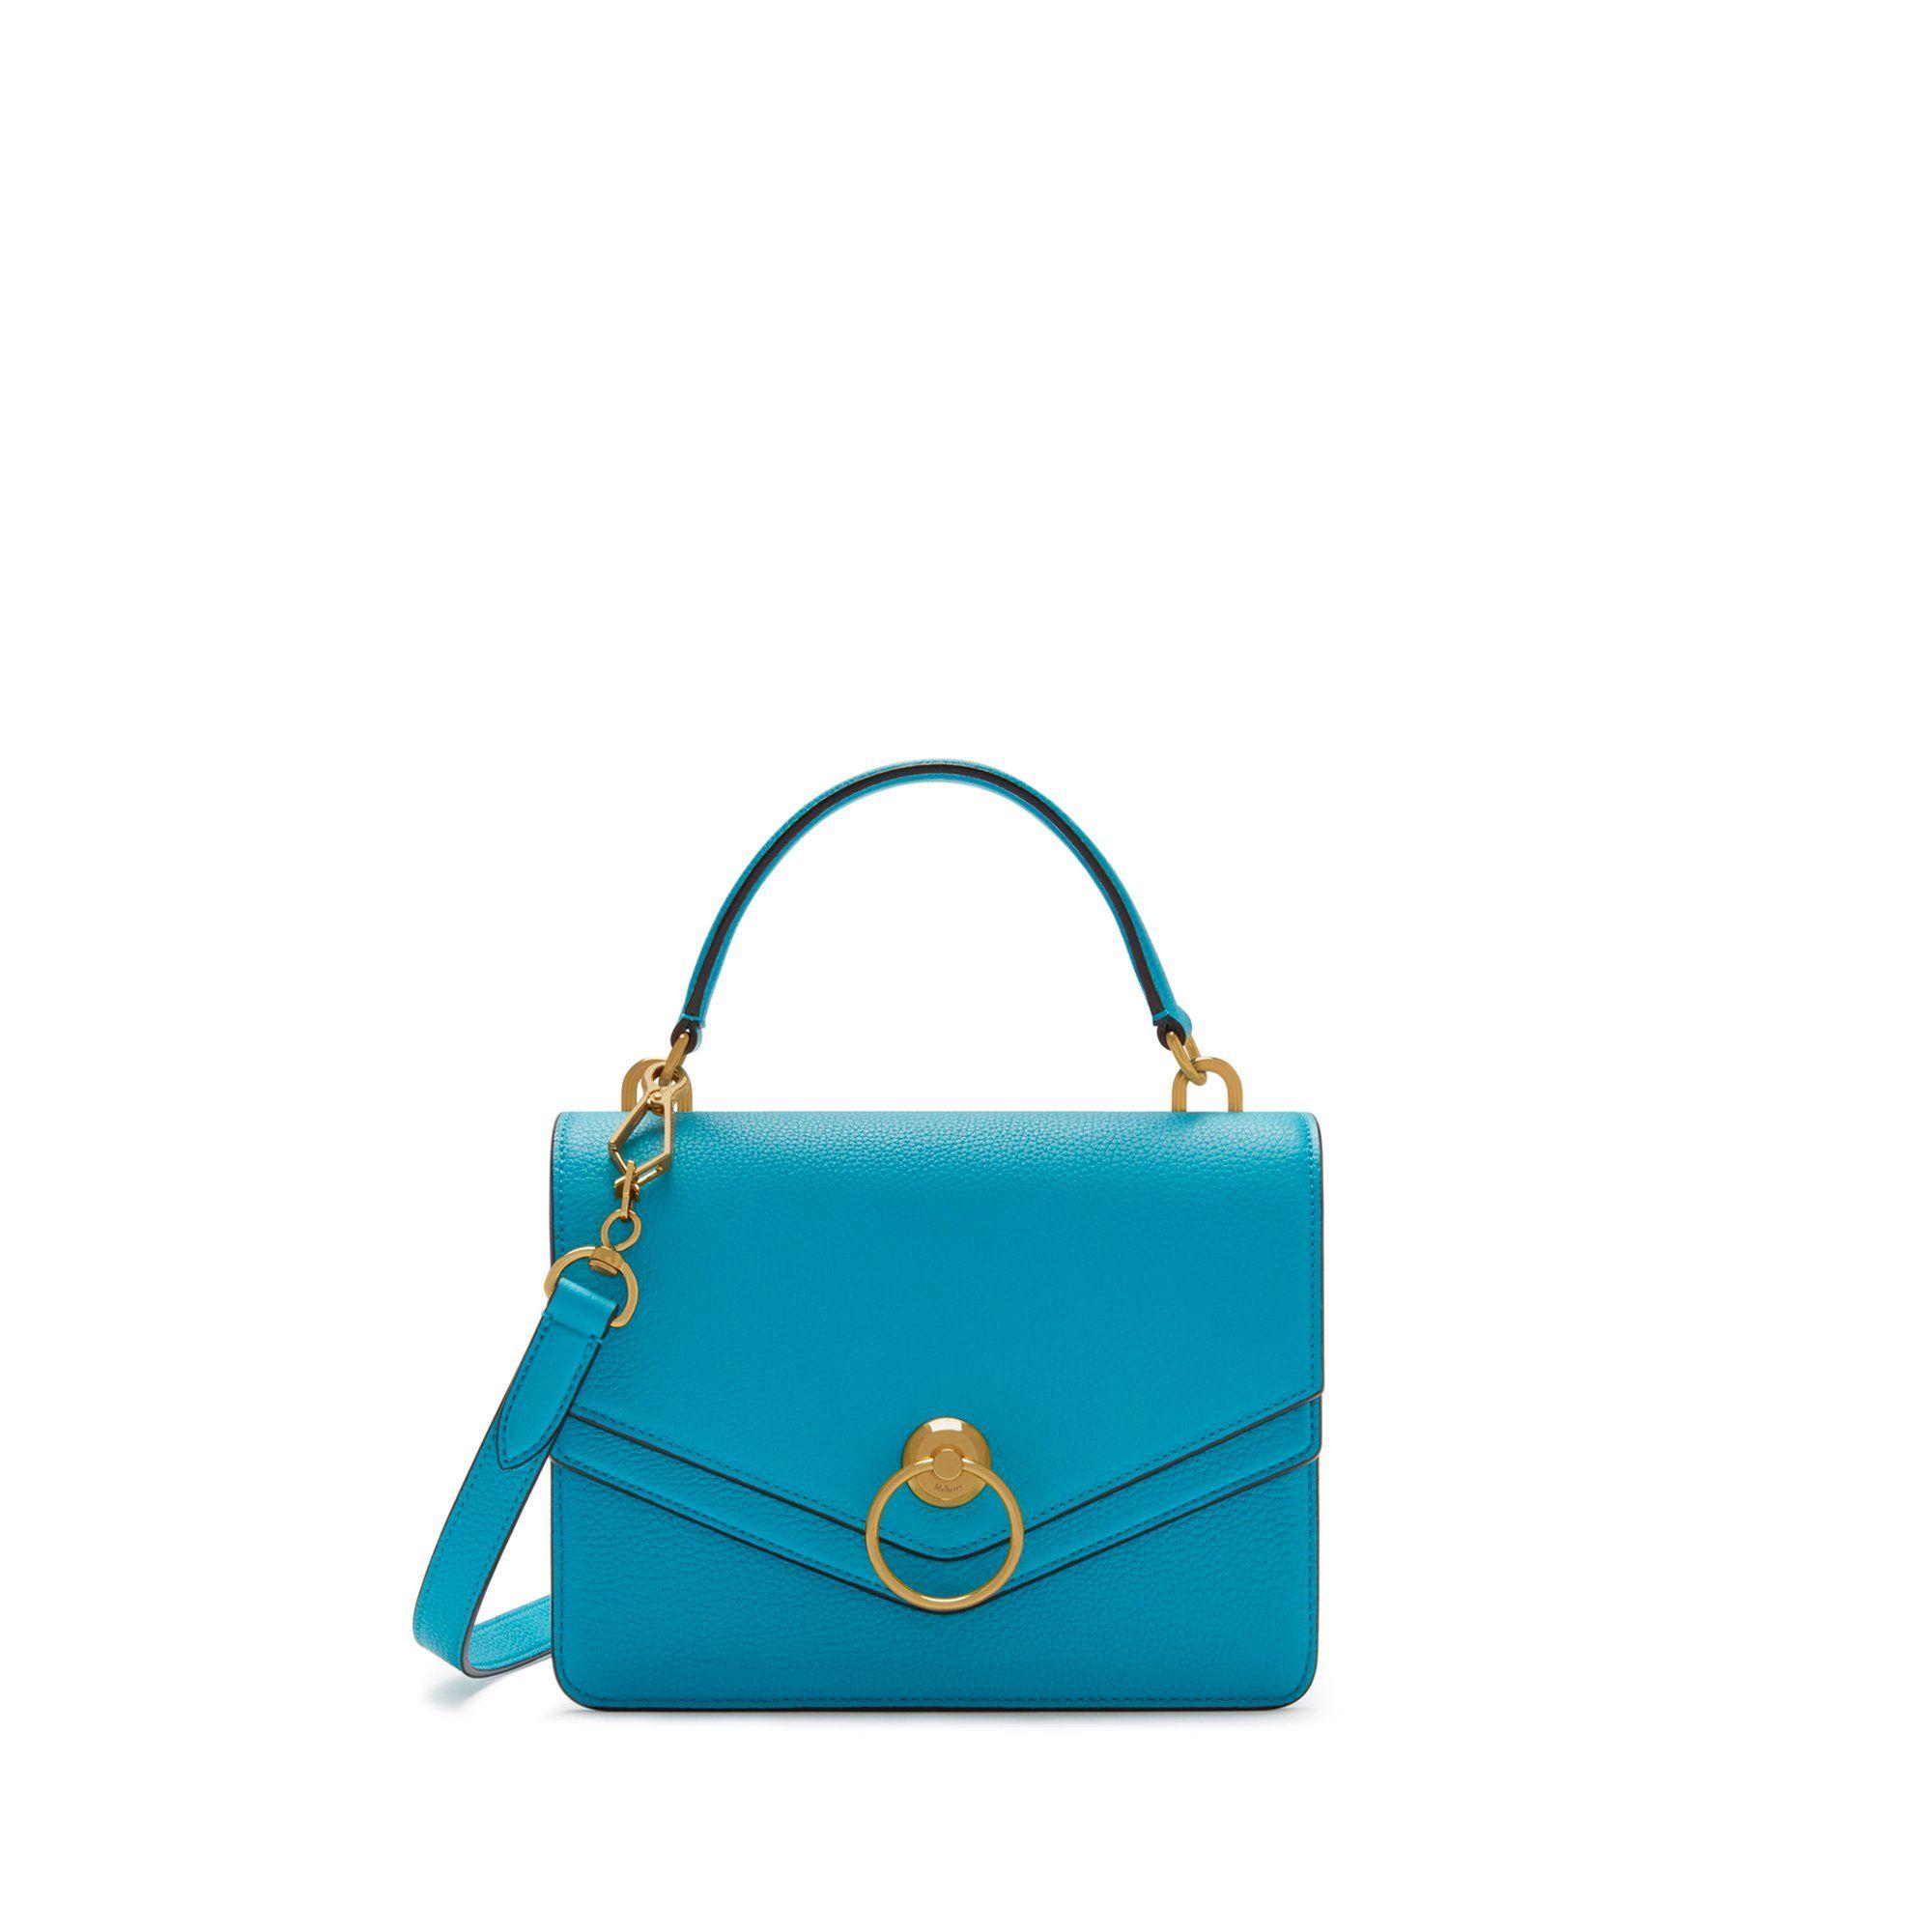 88a3337ff95 Shoulder Bags   Women s Bags   Women   Mulberry